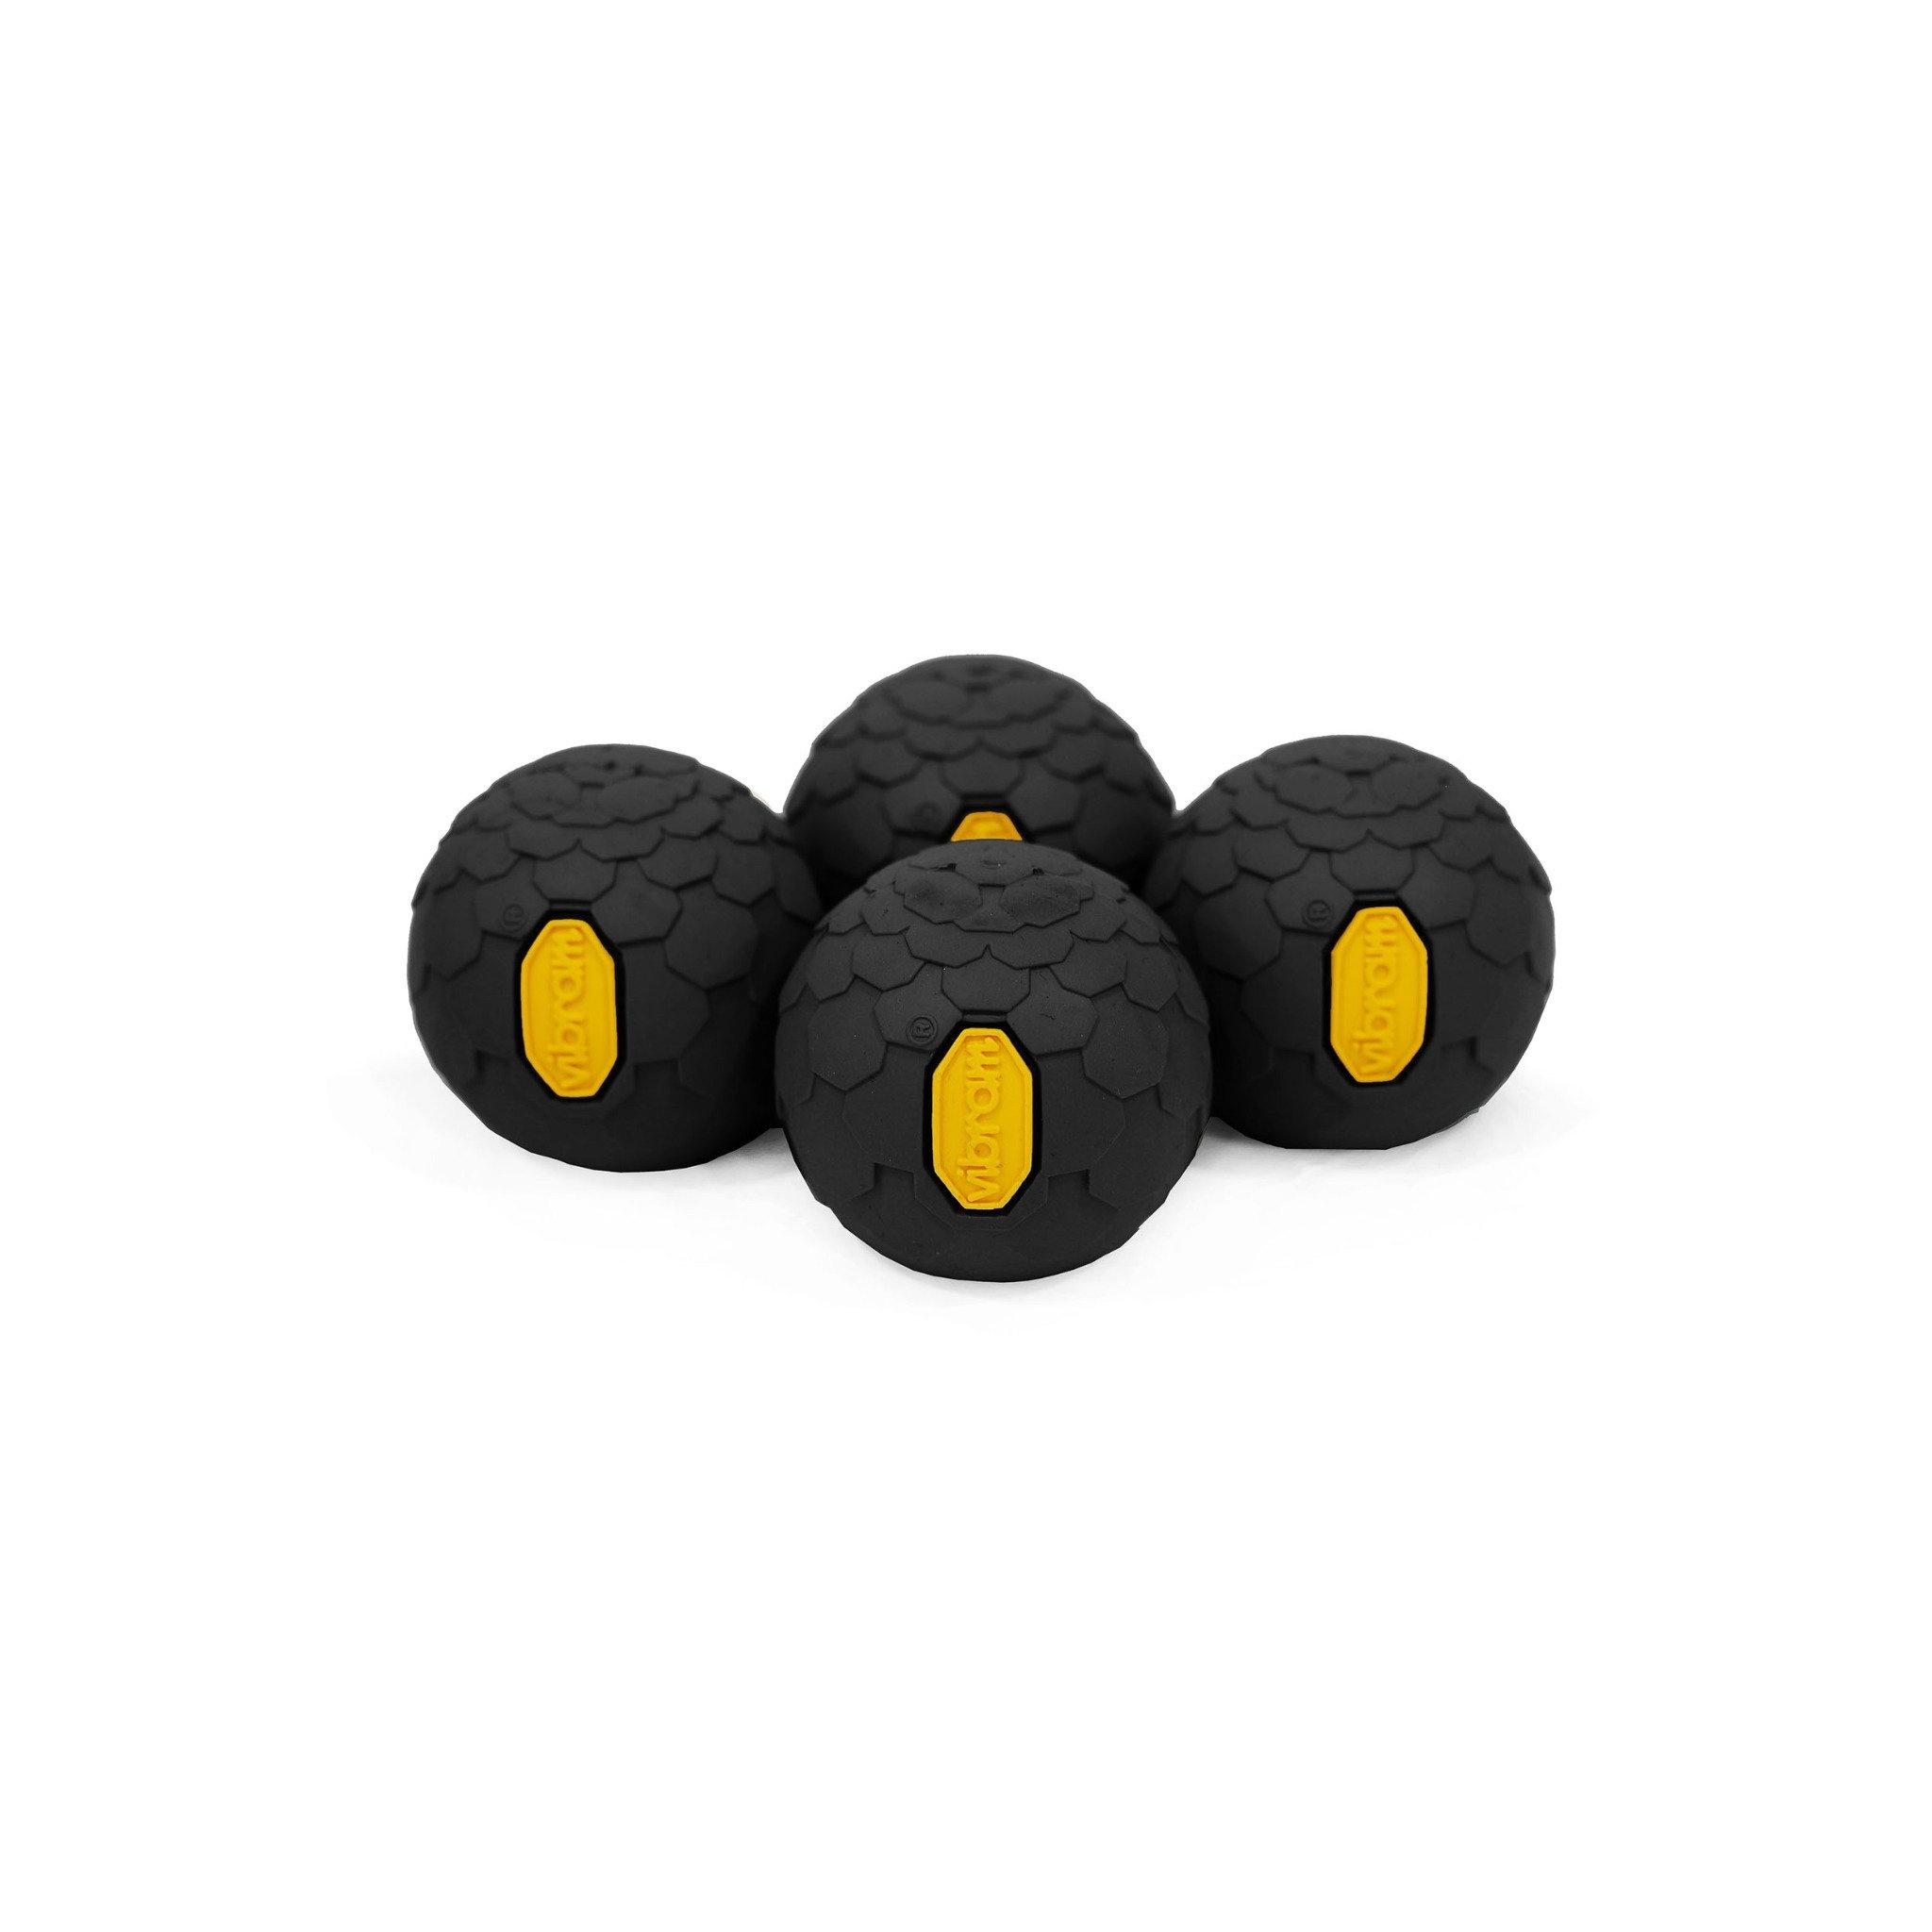 Vibram Ball Feet Set 45mm - Black